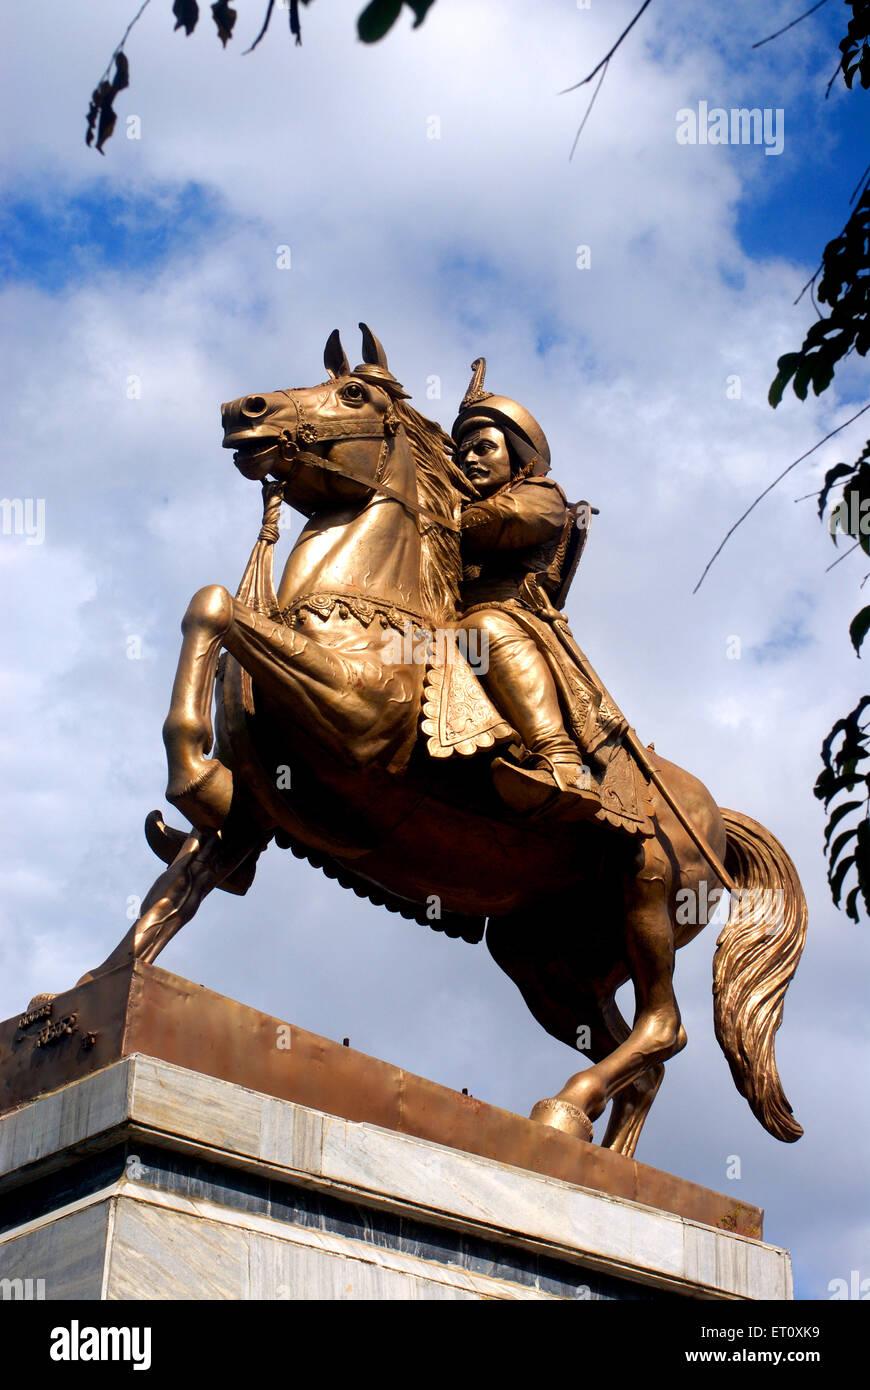 Equestrian bronze metal statue of thorale senior bajirao peshwa maratha ; Pune ; Maharashtra ; India - Stock Image